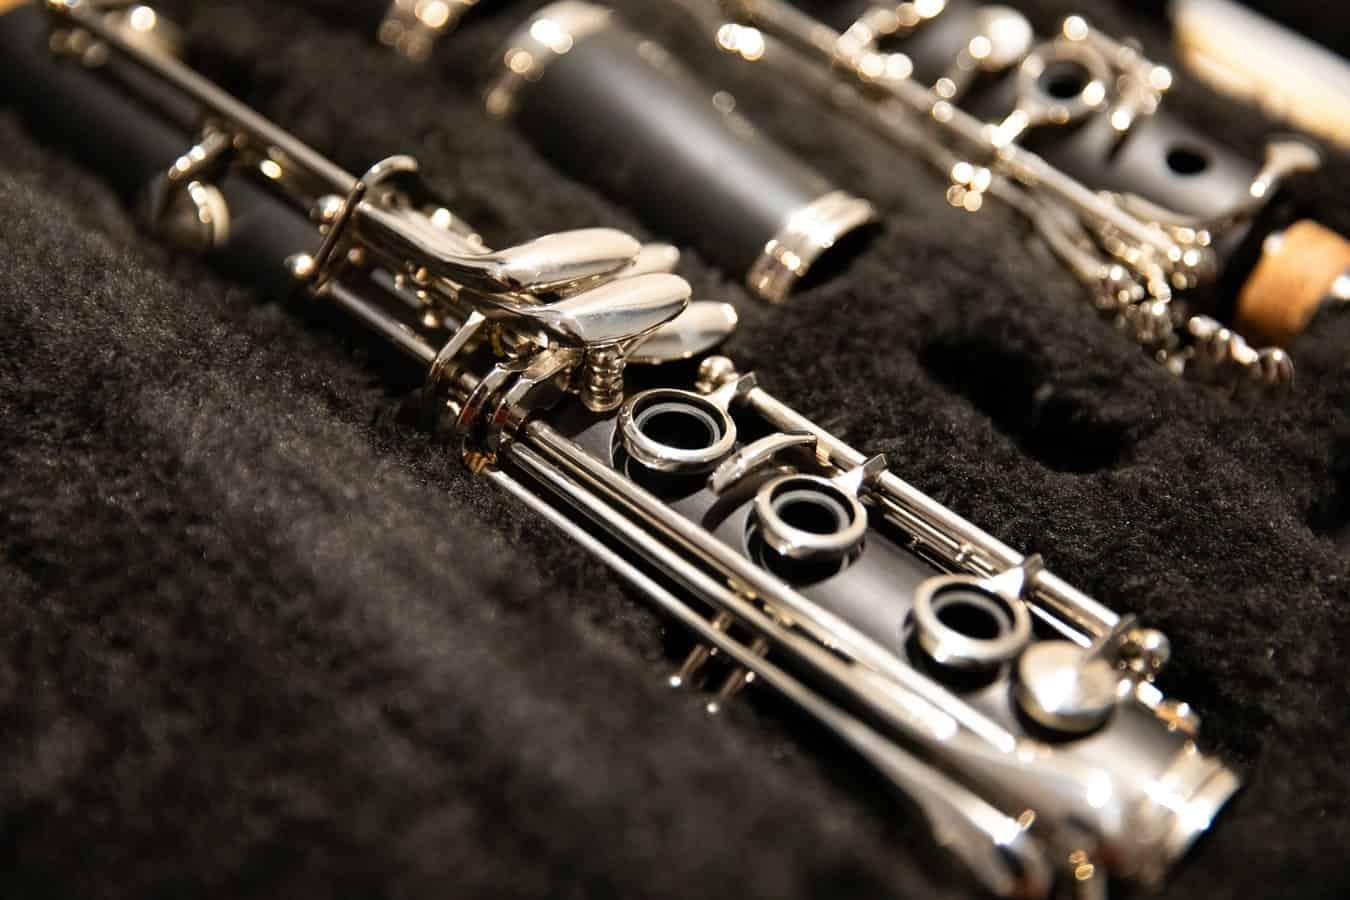 quality clarinets